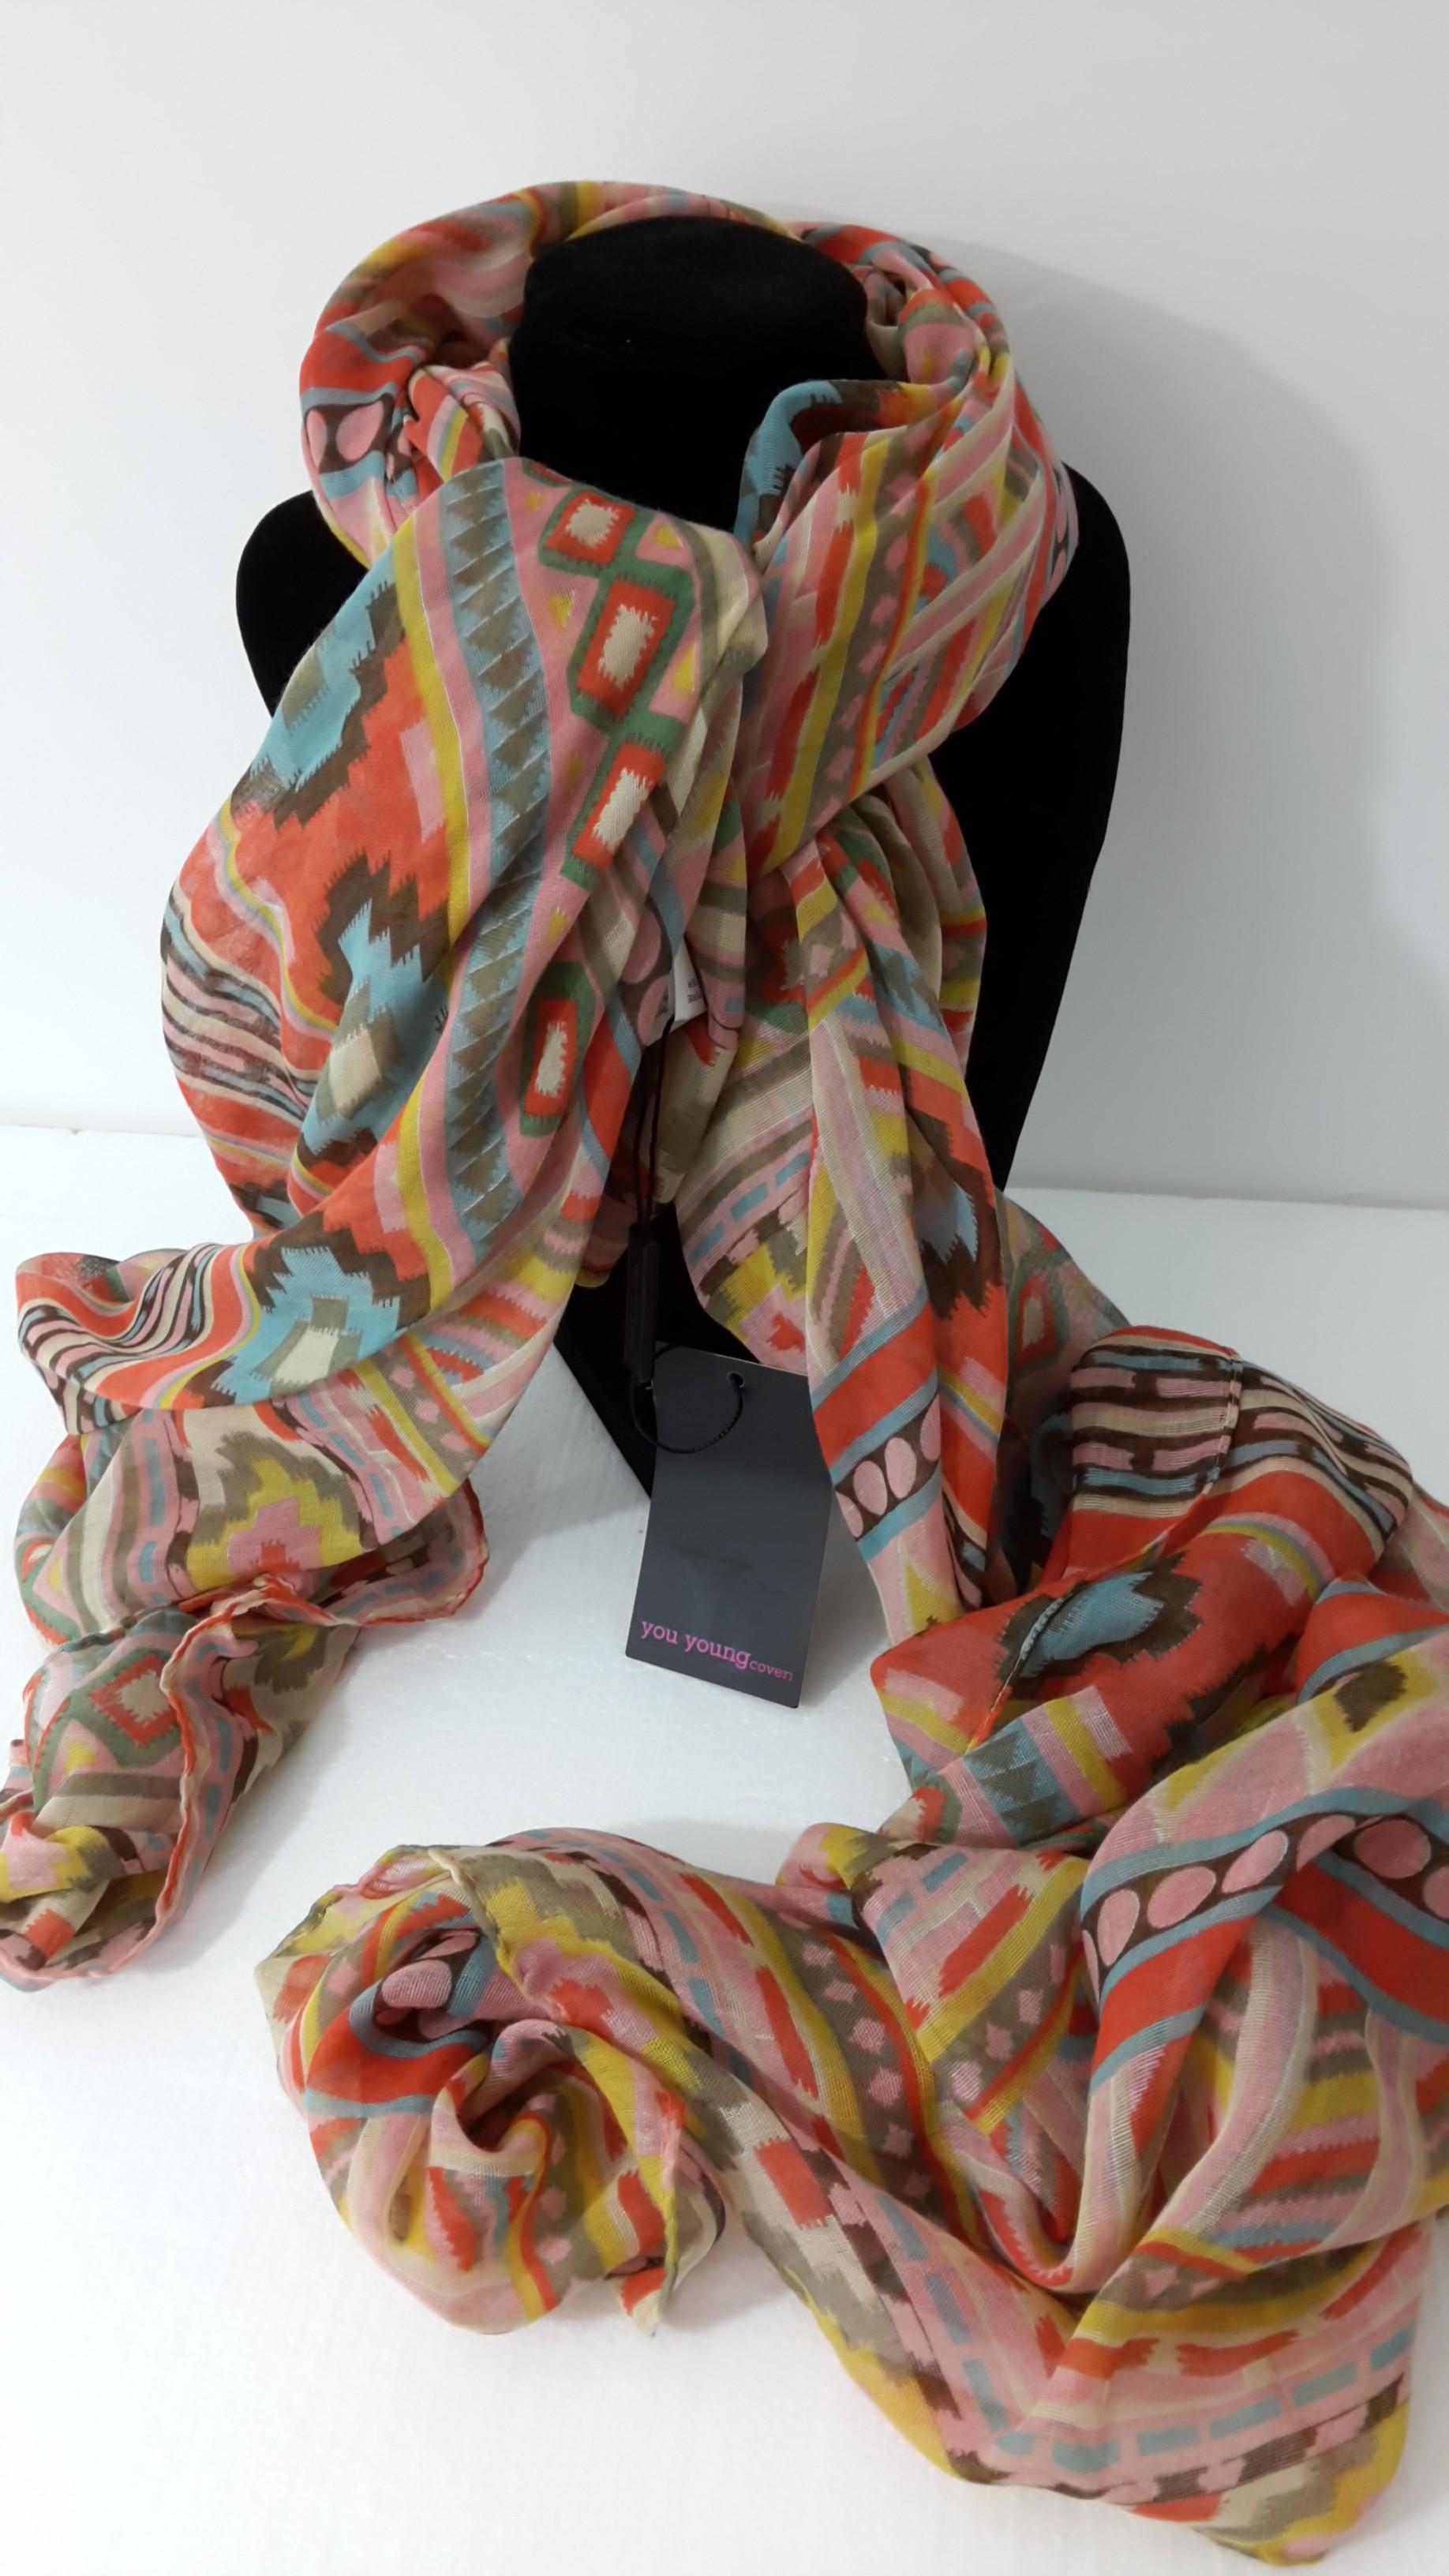 incontrare 35dd6 2b5c8 stock foulard firmati | Italian Stock